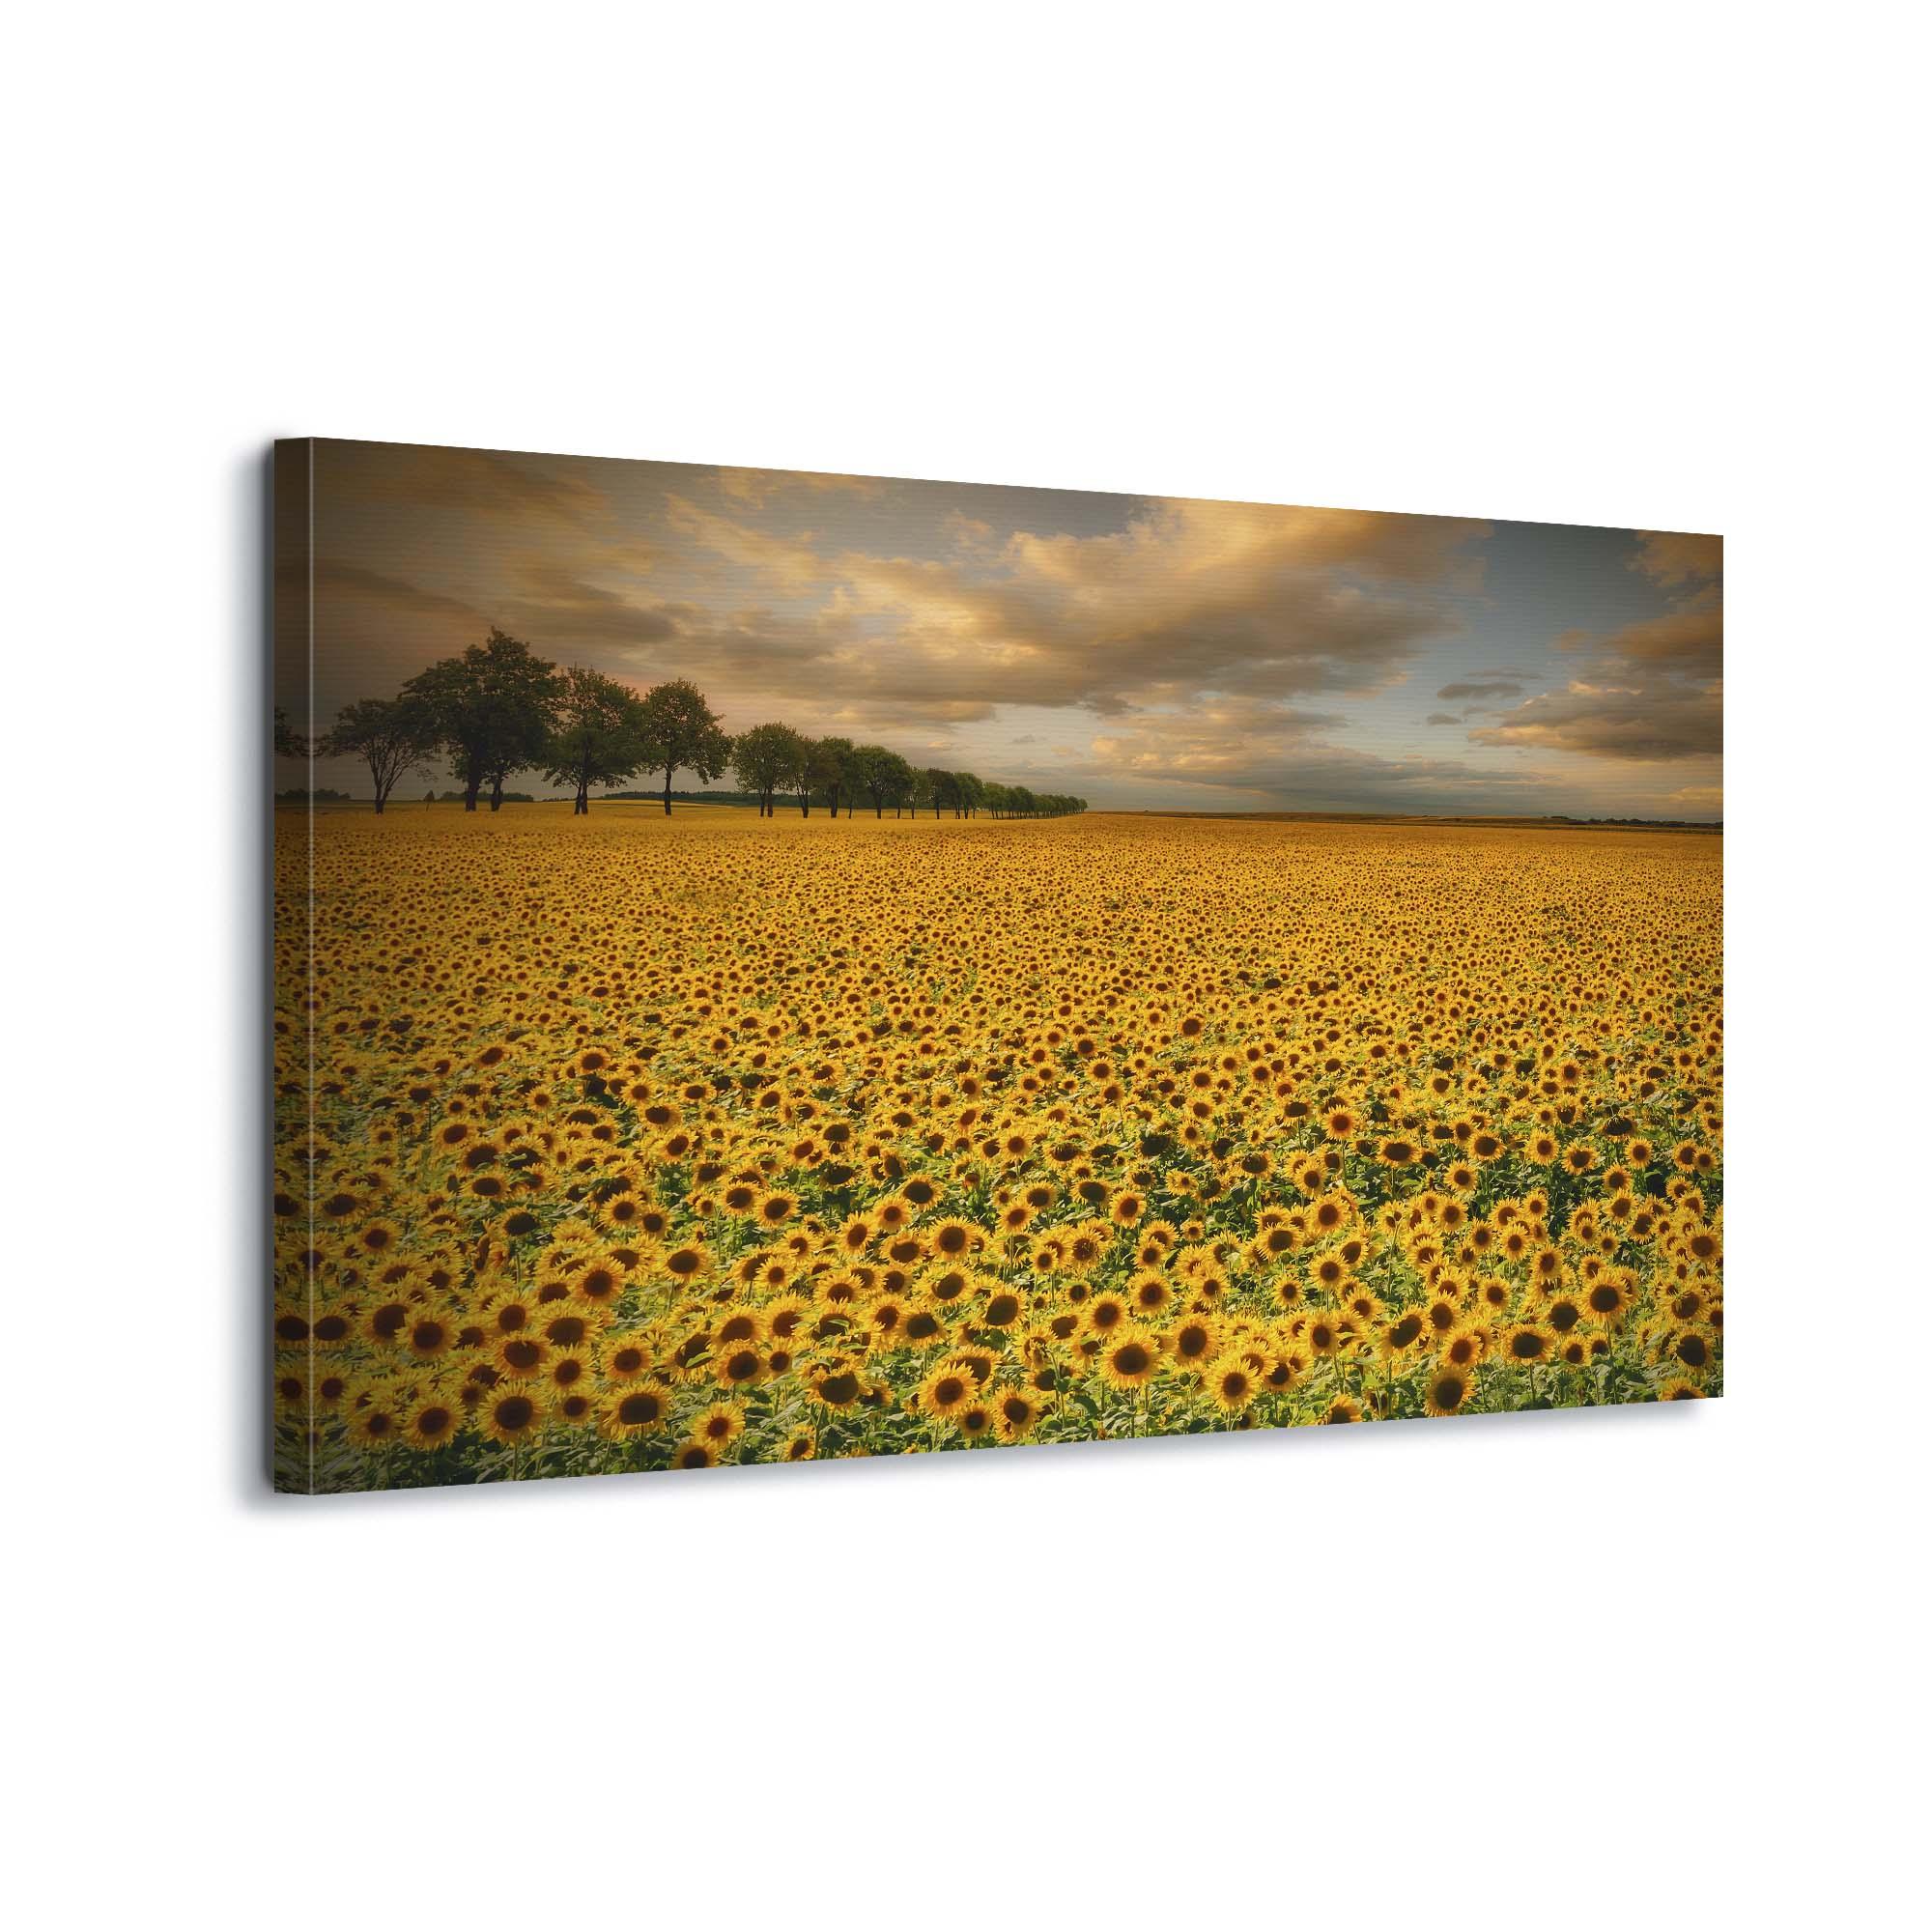 Sunflowers by Piotr Krol